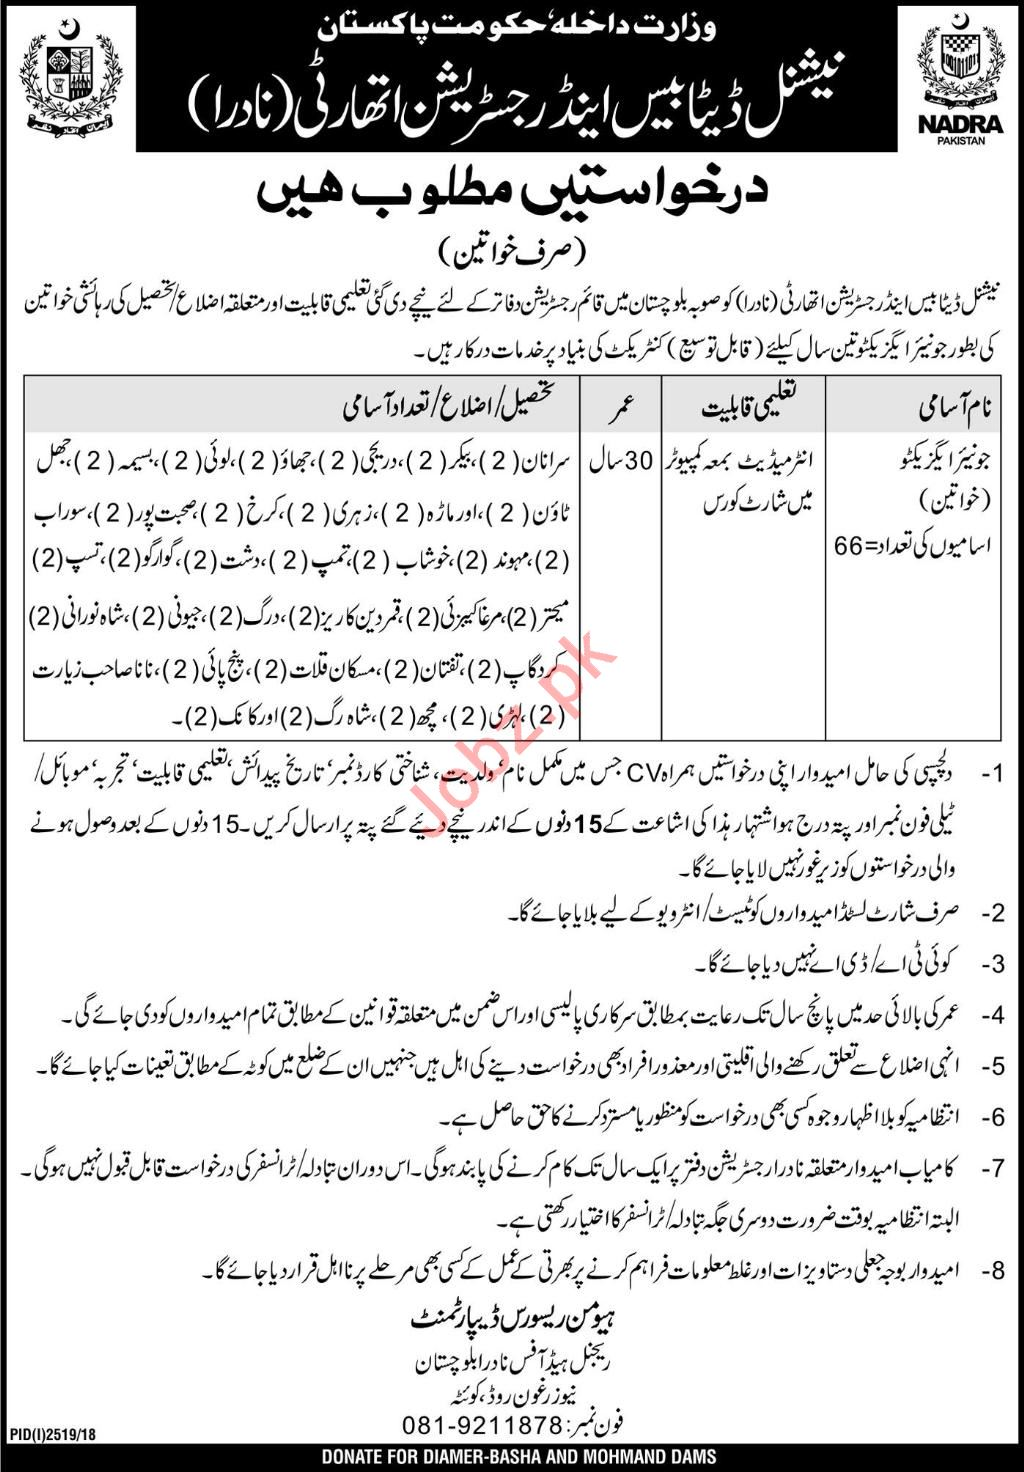 NADRA Regional Head Office Quetta Jobs 2019 for Executive